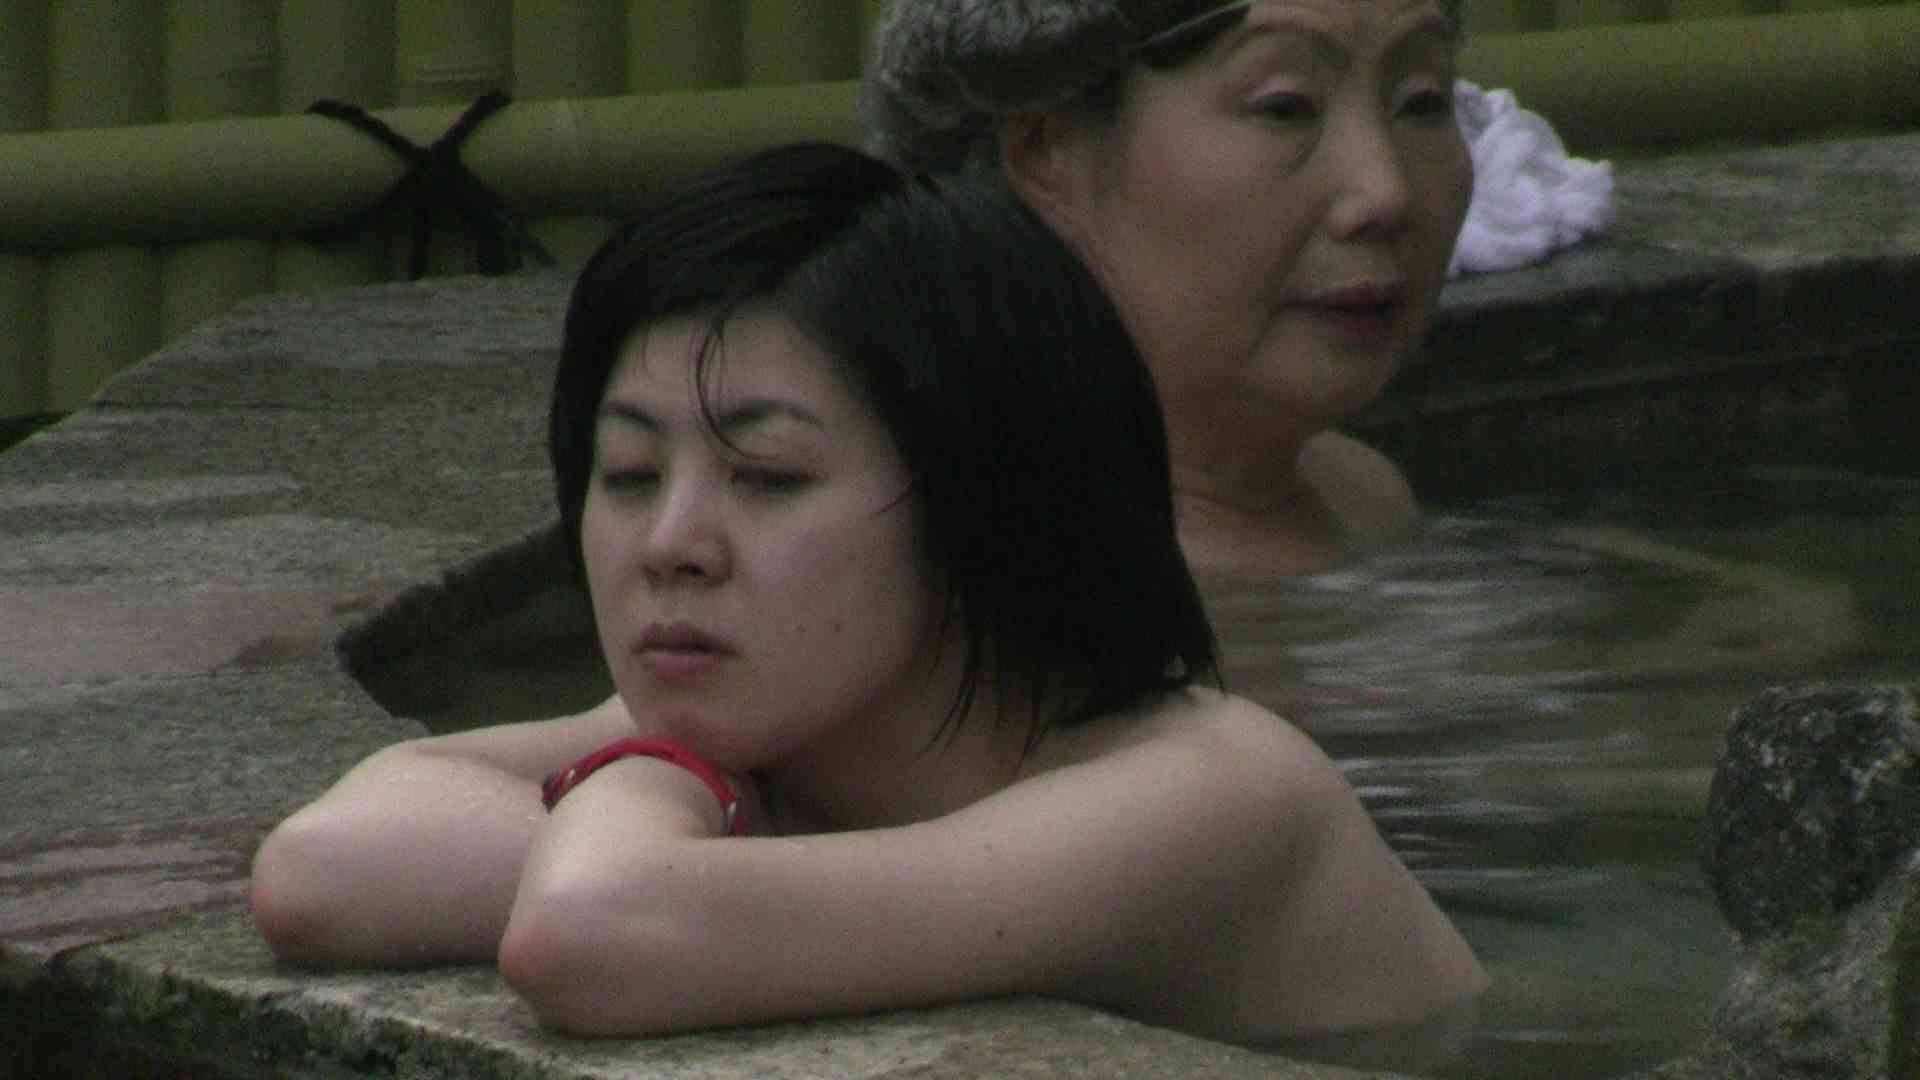 Aquaな露天風呂Vol.685 OLのプライベート  13pic 6